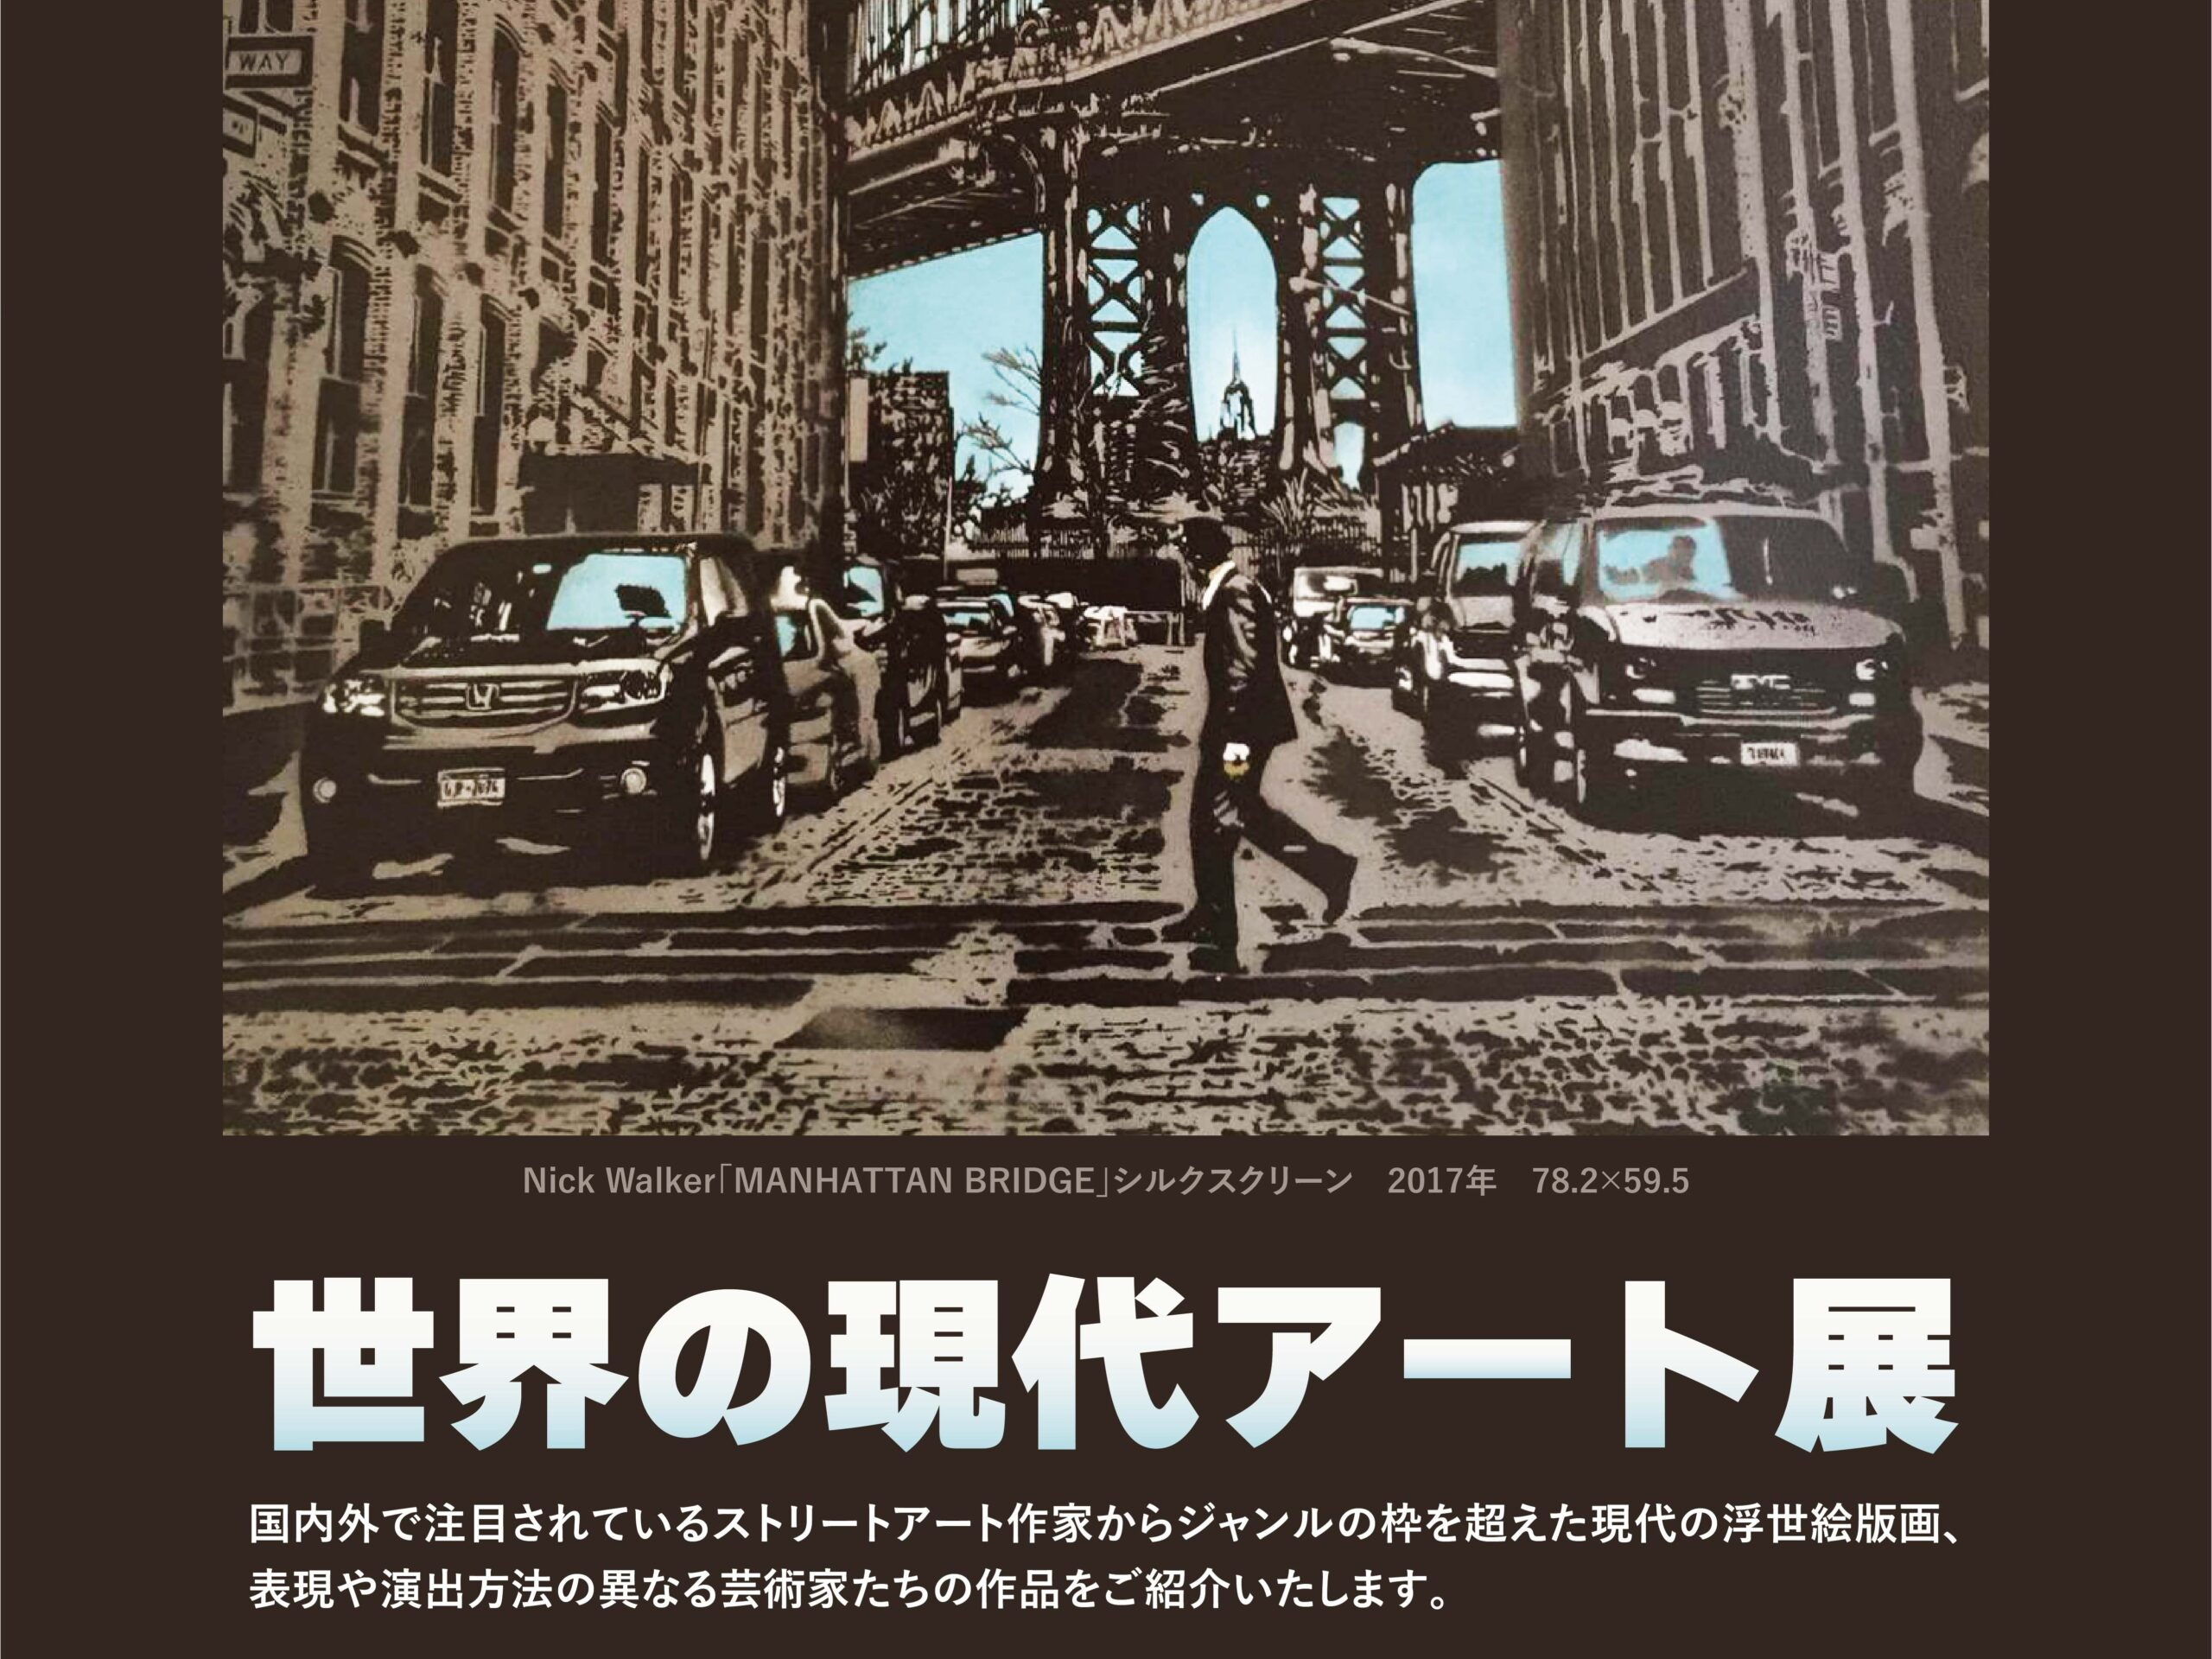 Nick Walker poster for art Exhibition in Japan